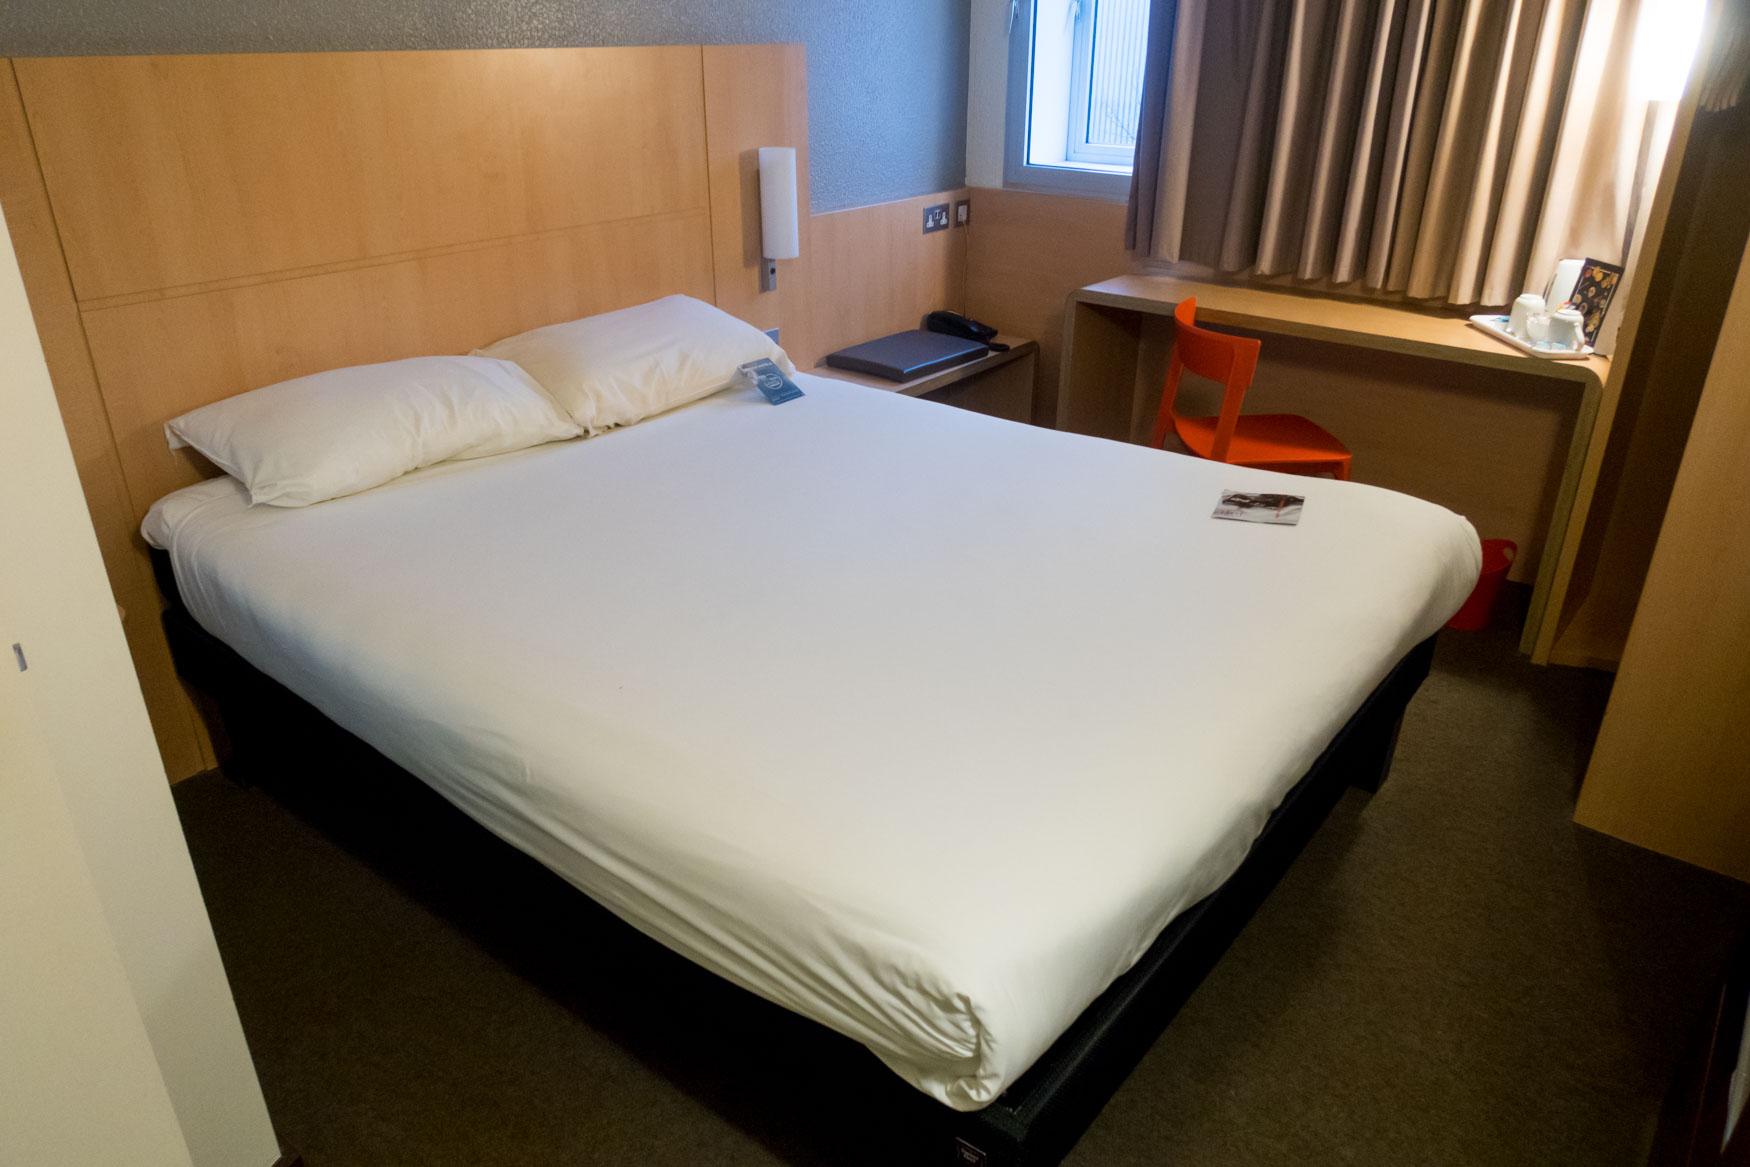 Ibis London Heathrow Bed